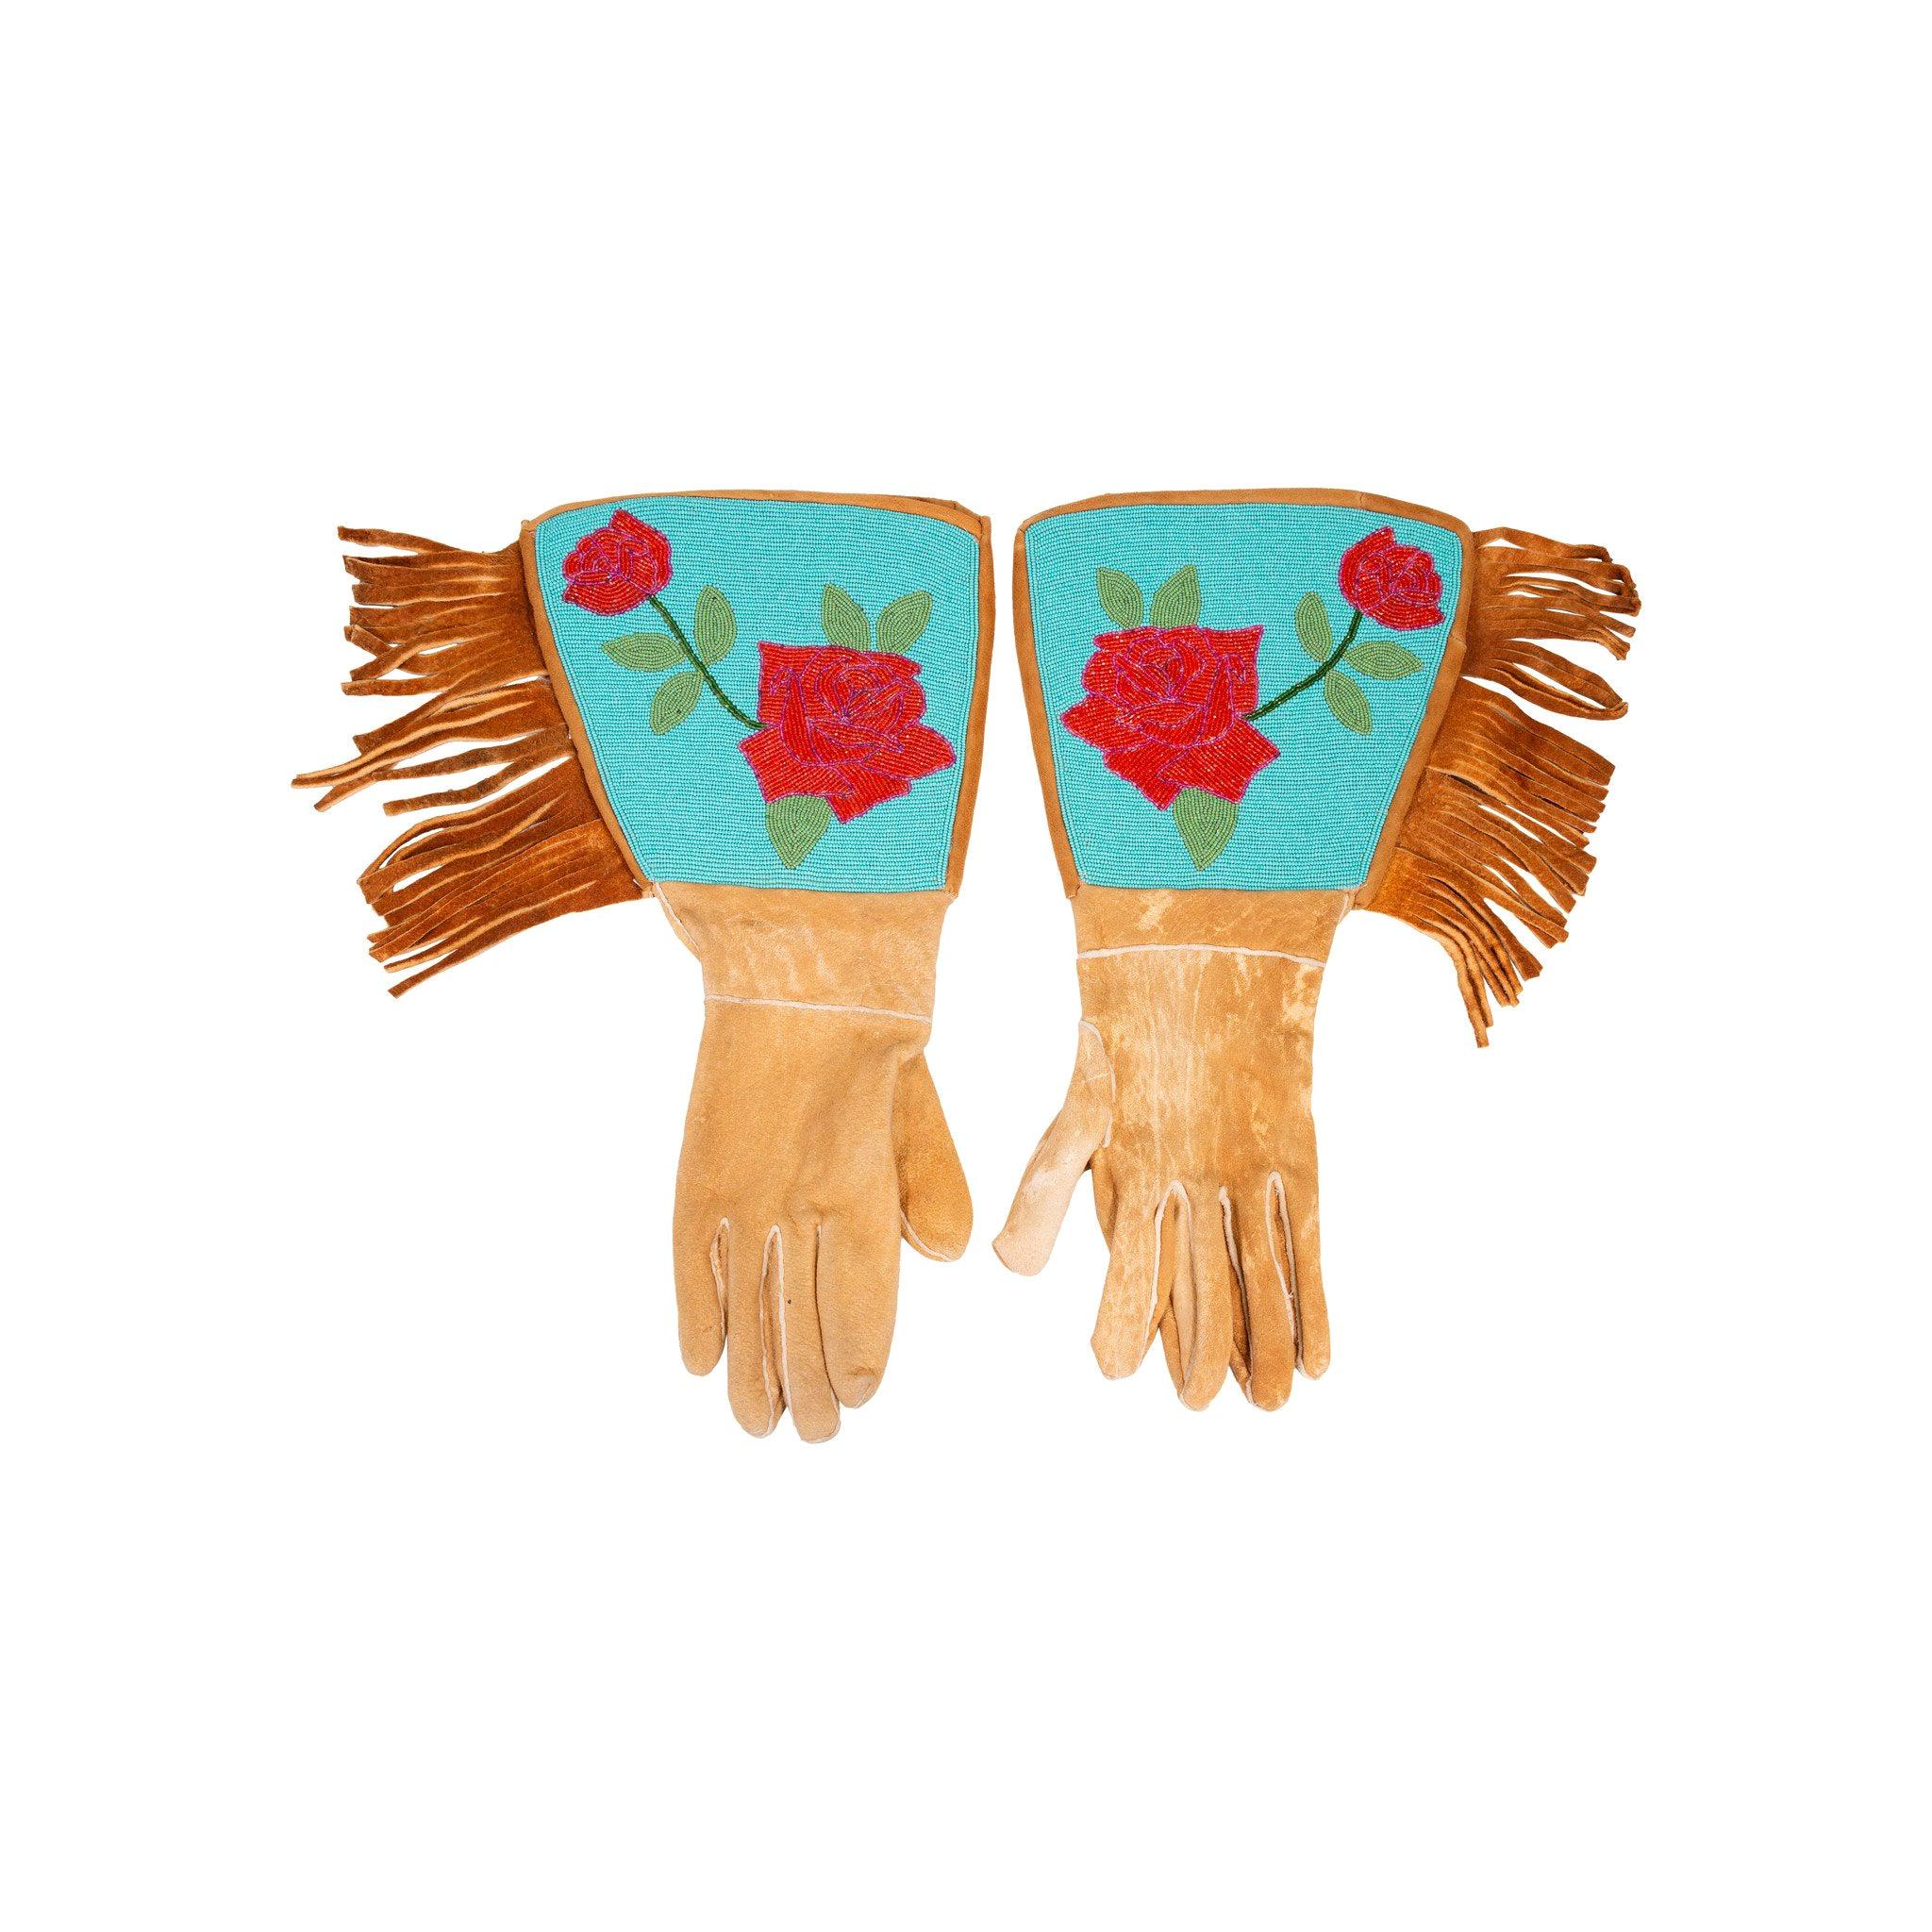 Authentic Native Nez Perce Tribe Beaded Gauntlets